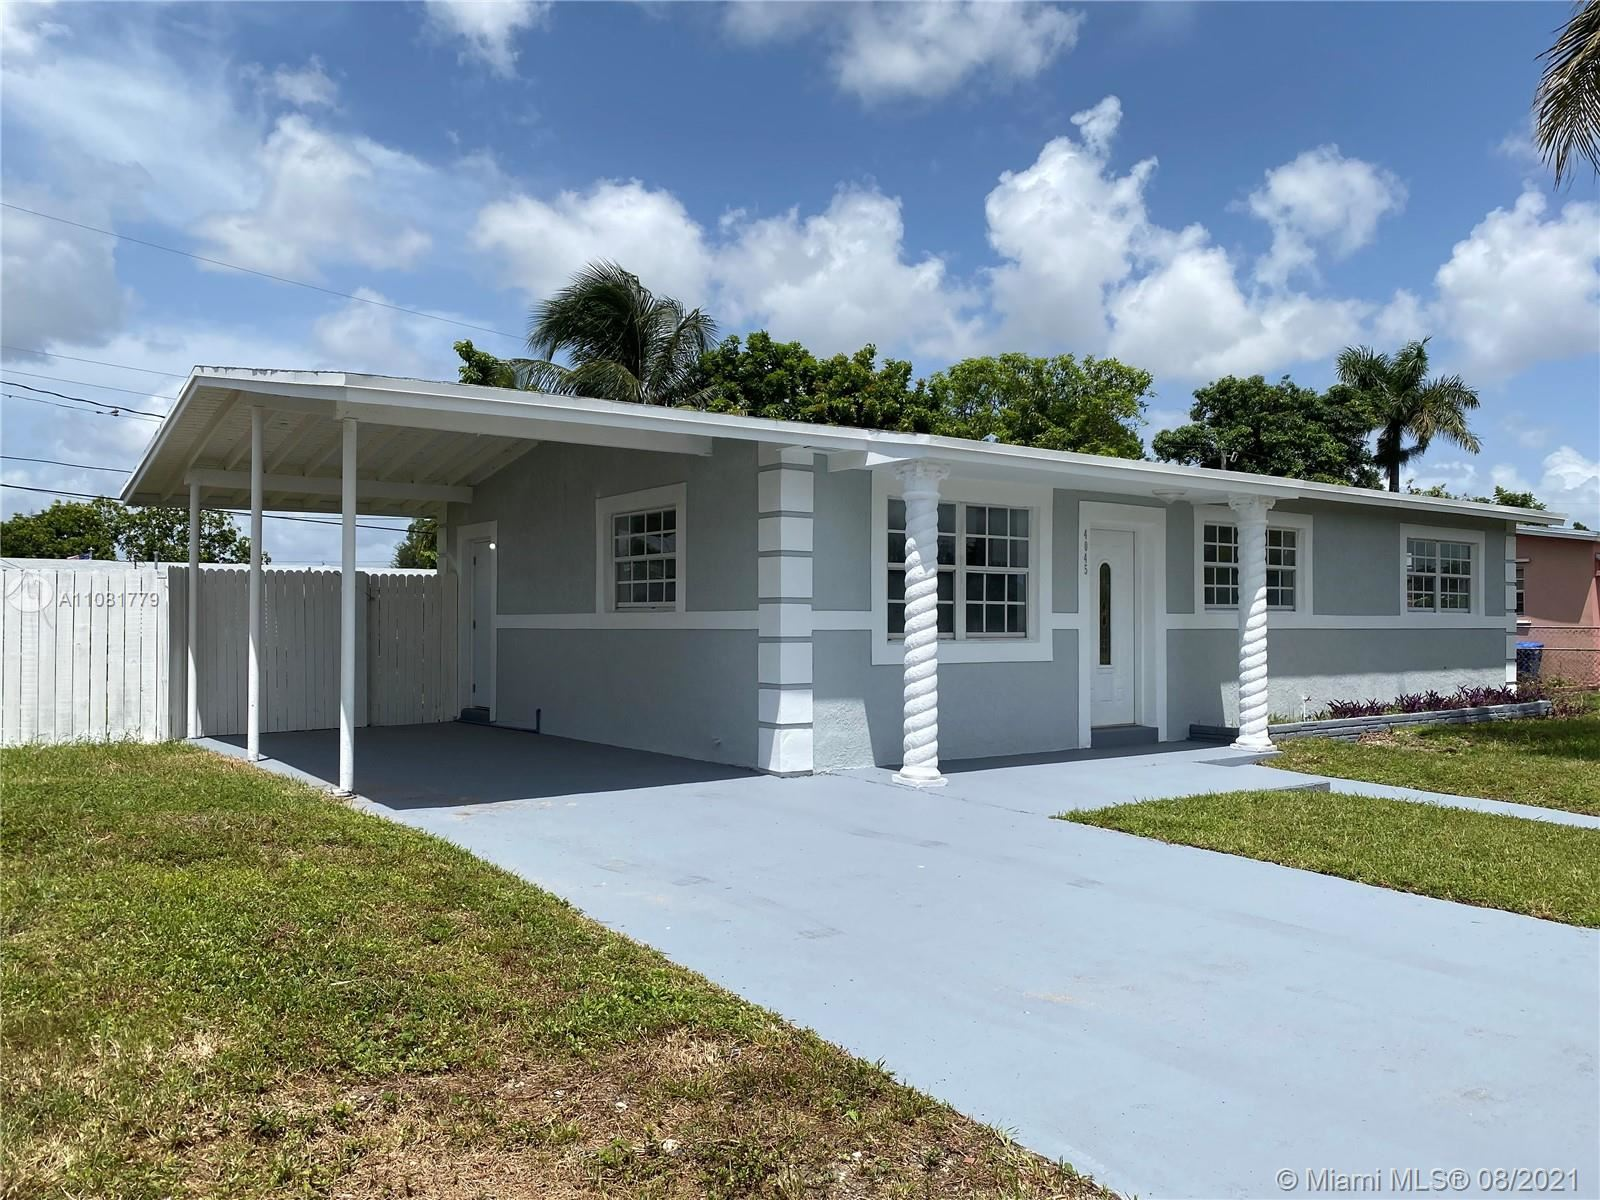 4045 NW 191st Ter, Miami Gardens, FL 33055 - #: A11081779